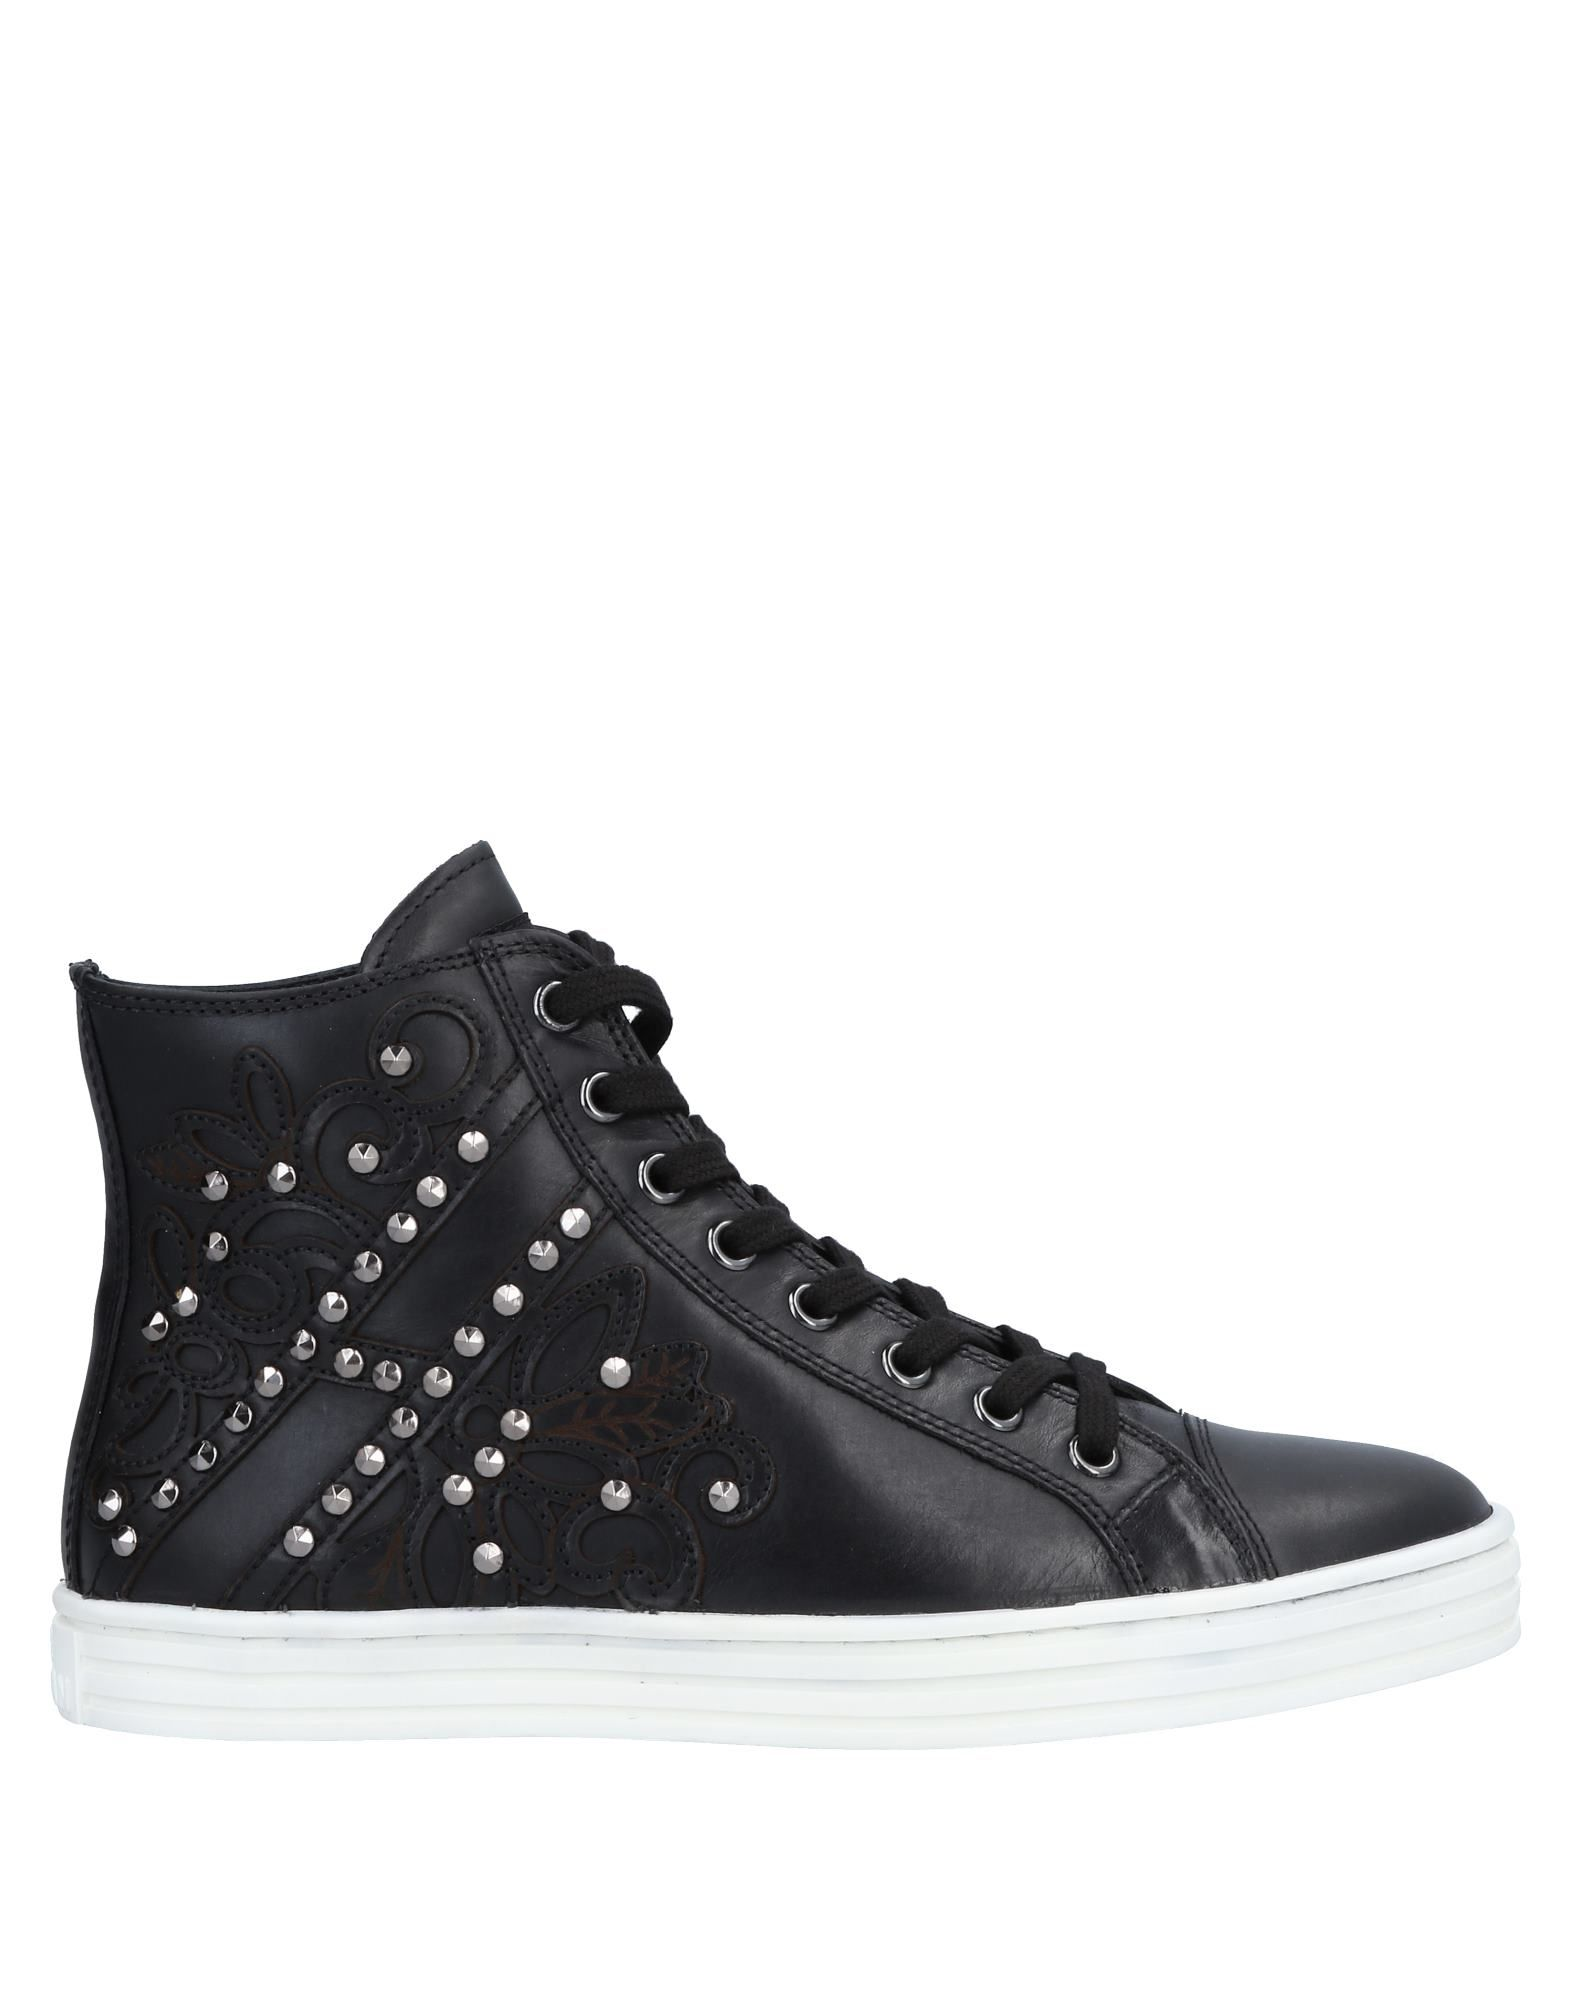 Rabatt Schuhe Hogan Damen Rebel Sneakers Damen Hogan  11567648EM 7f224d